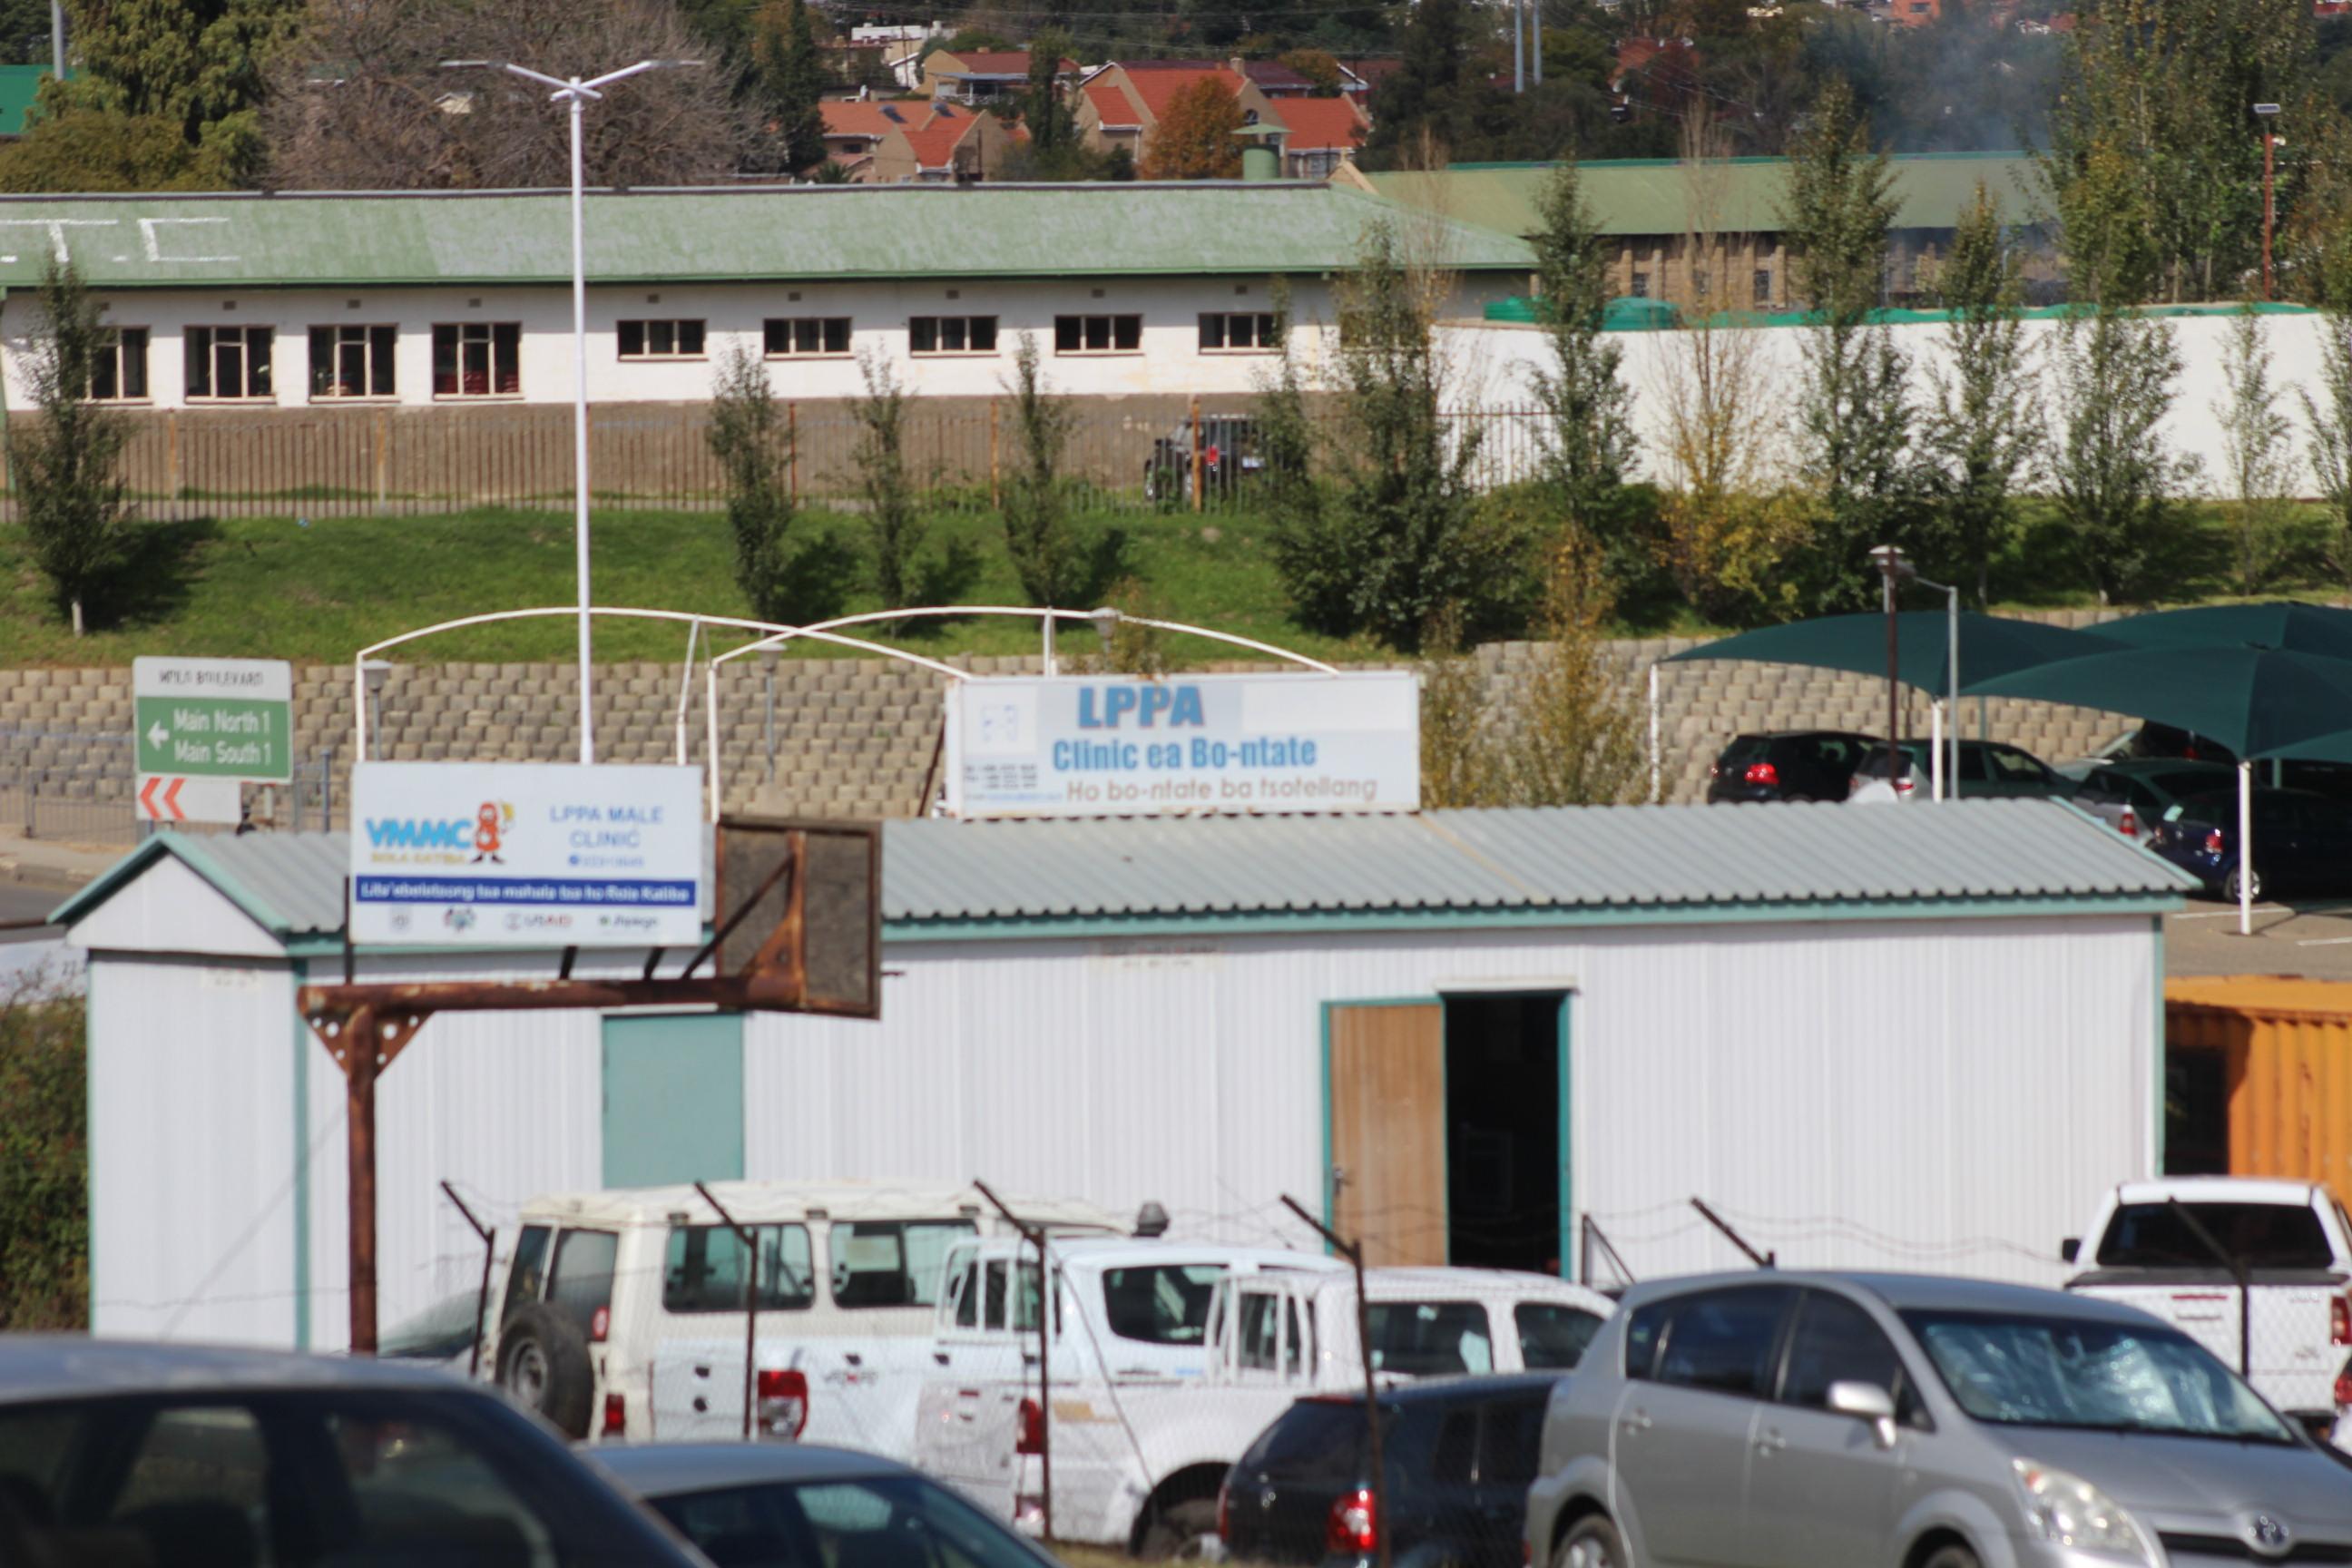 LPPA Male Clinic